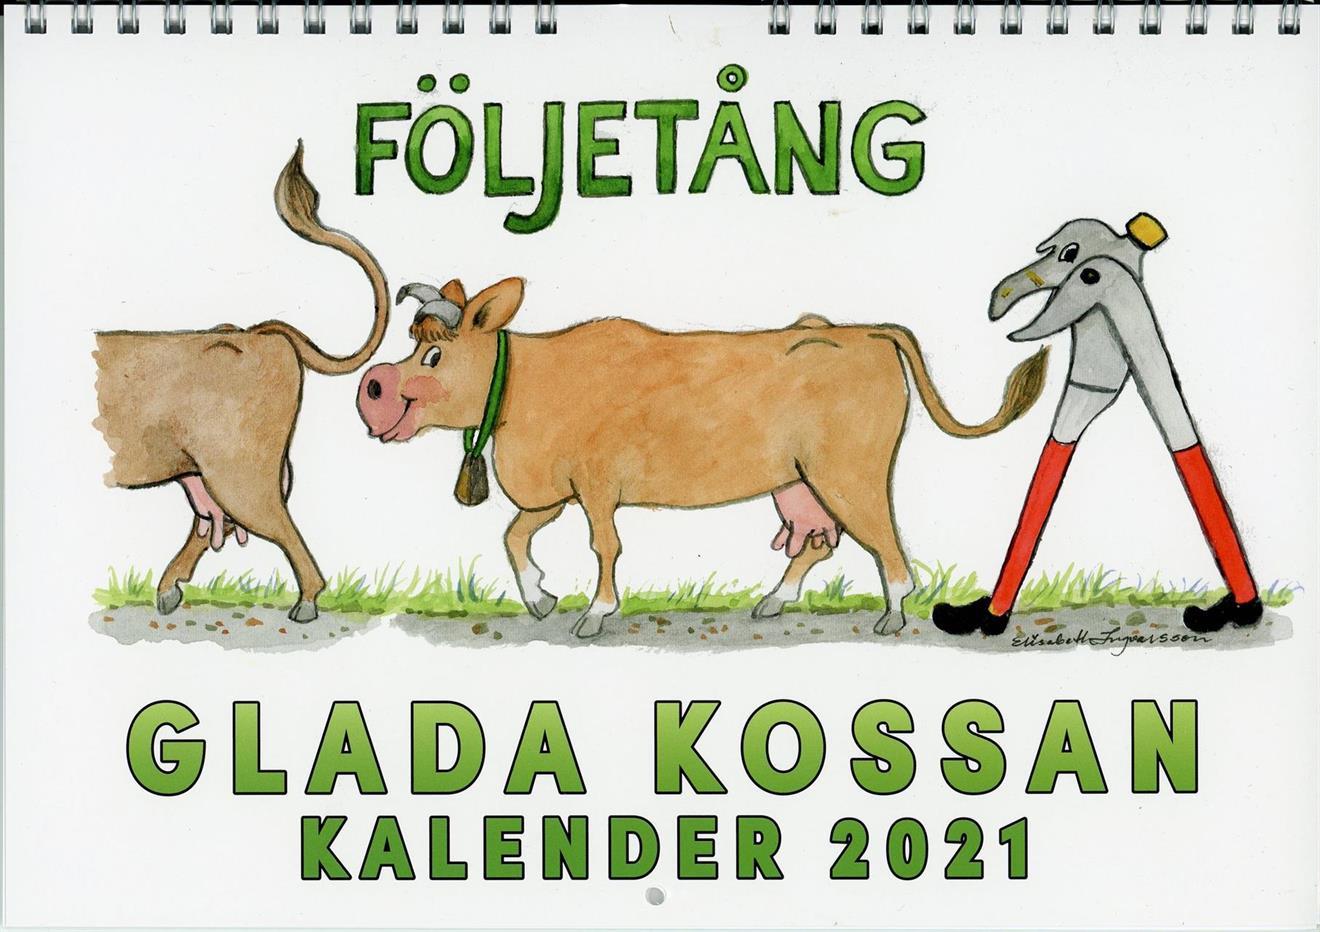 Glada Kossans Kalender 2021